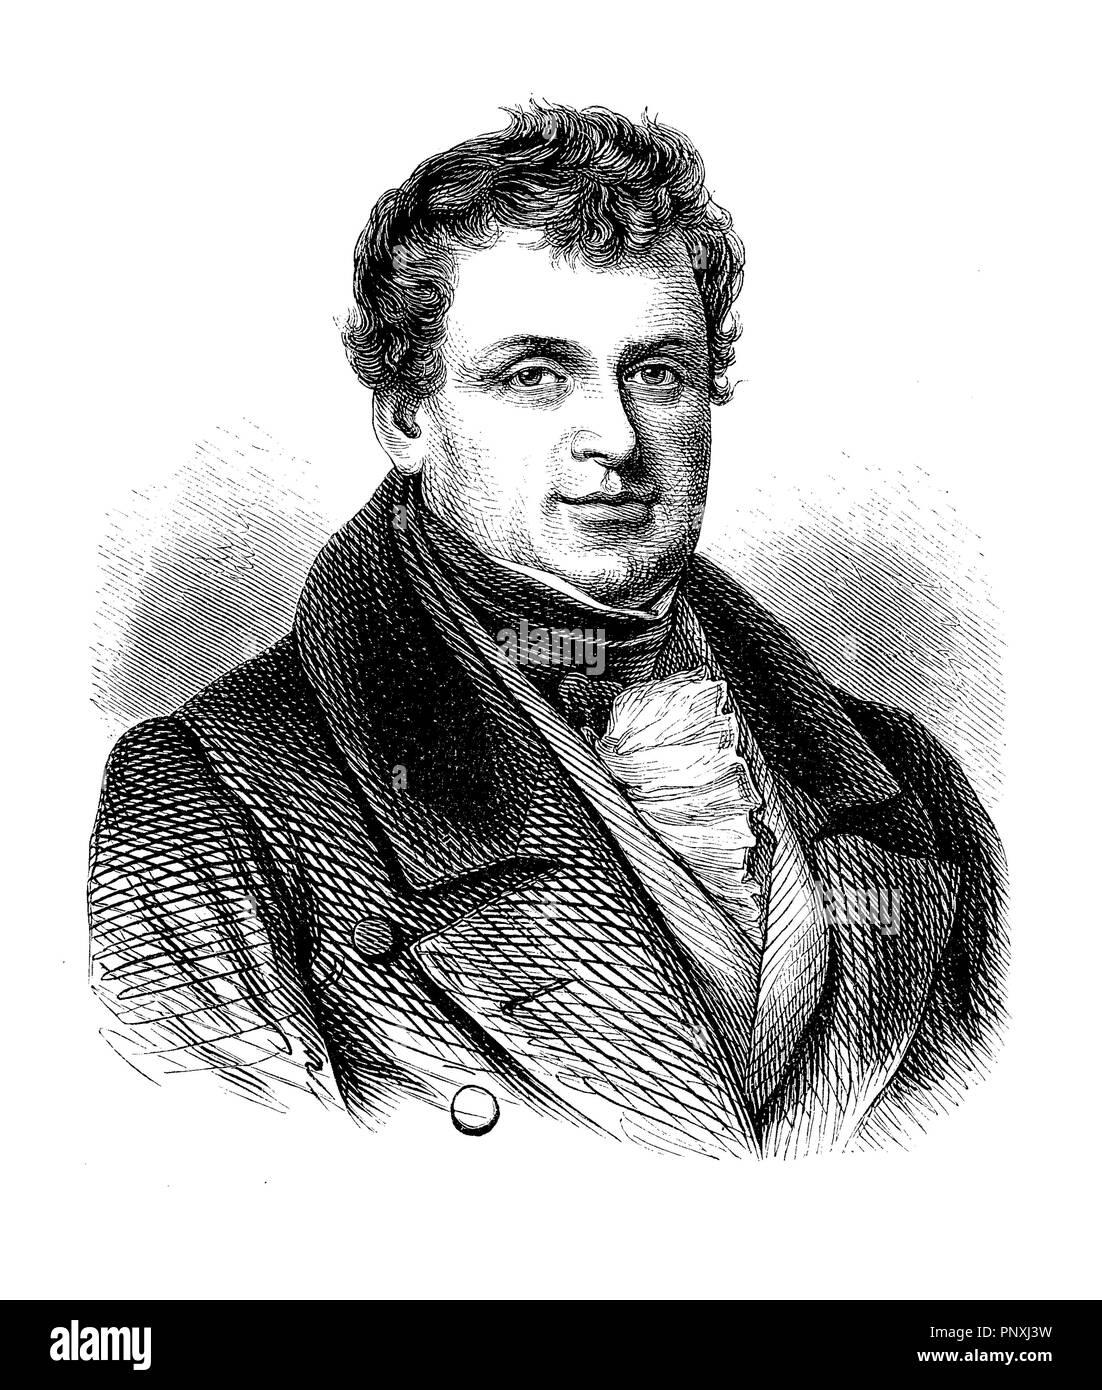 Engraving portrait of Daniel O'Connell (1775-1847), Irish political leader of the Catholic emancipation - Stock Image